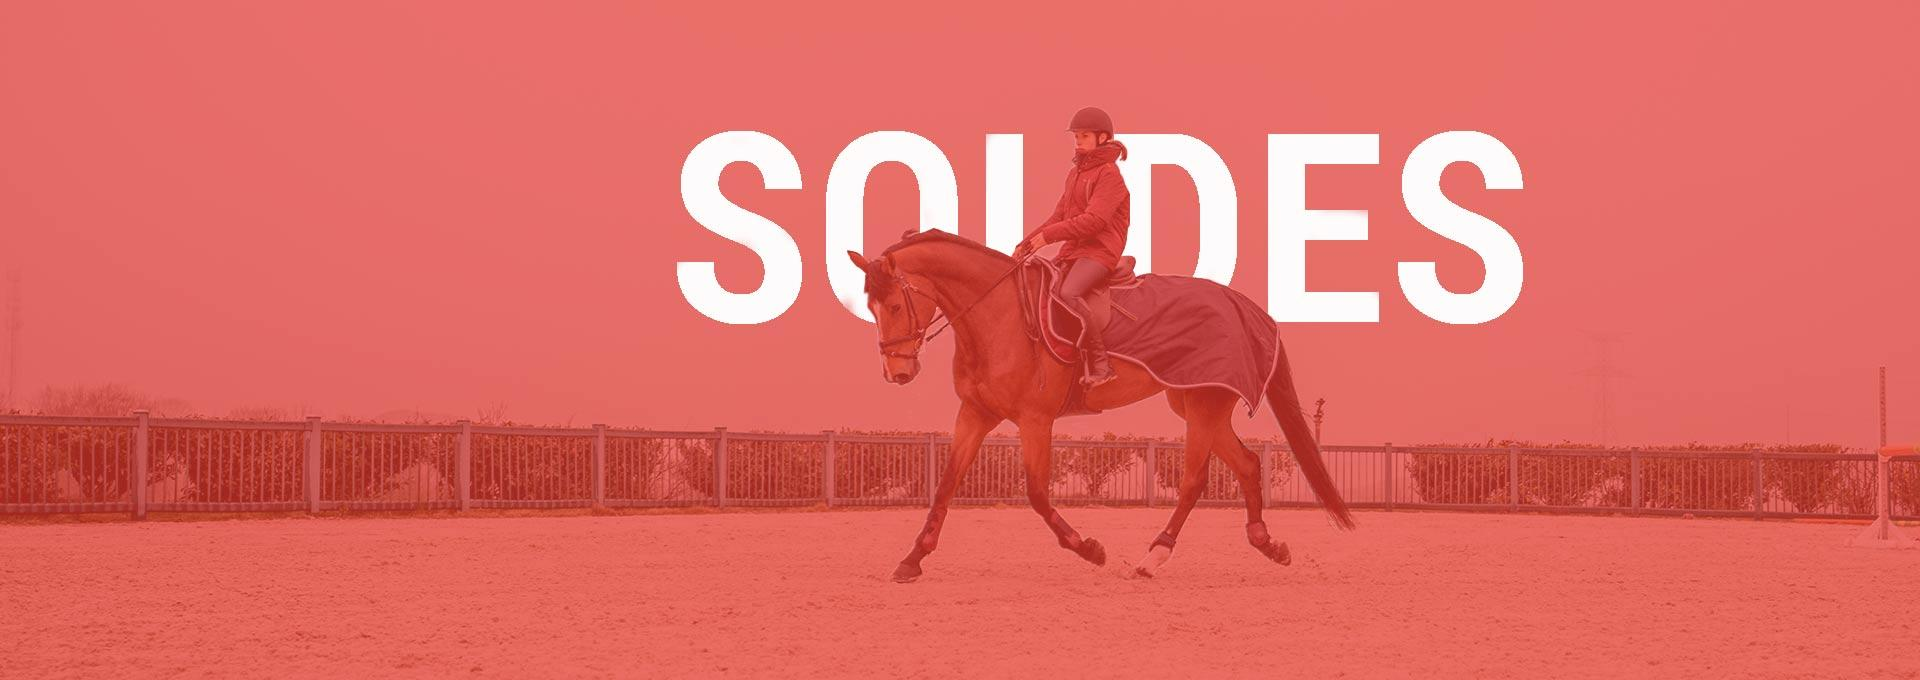 equitation SOLDES decathlon BONS PLANS